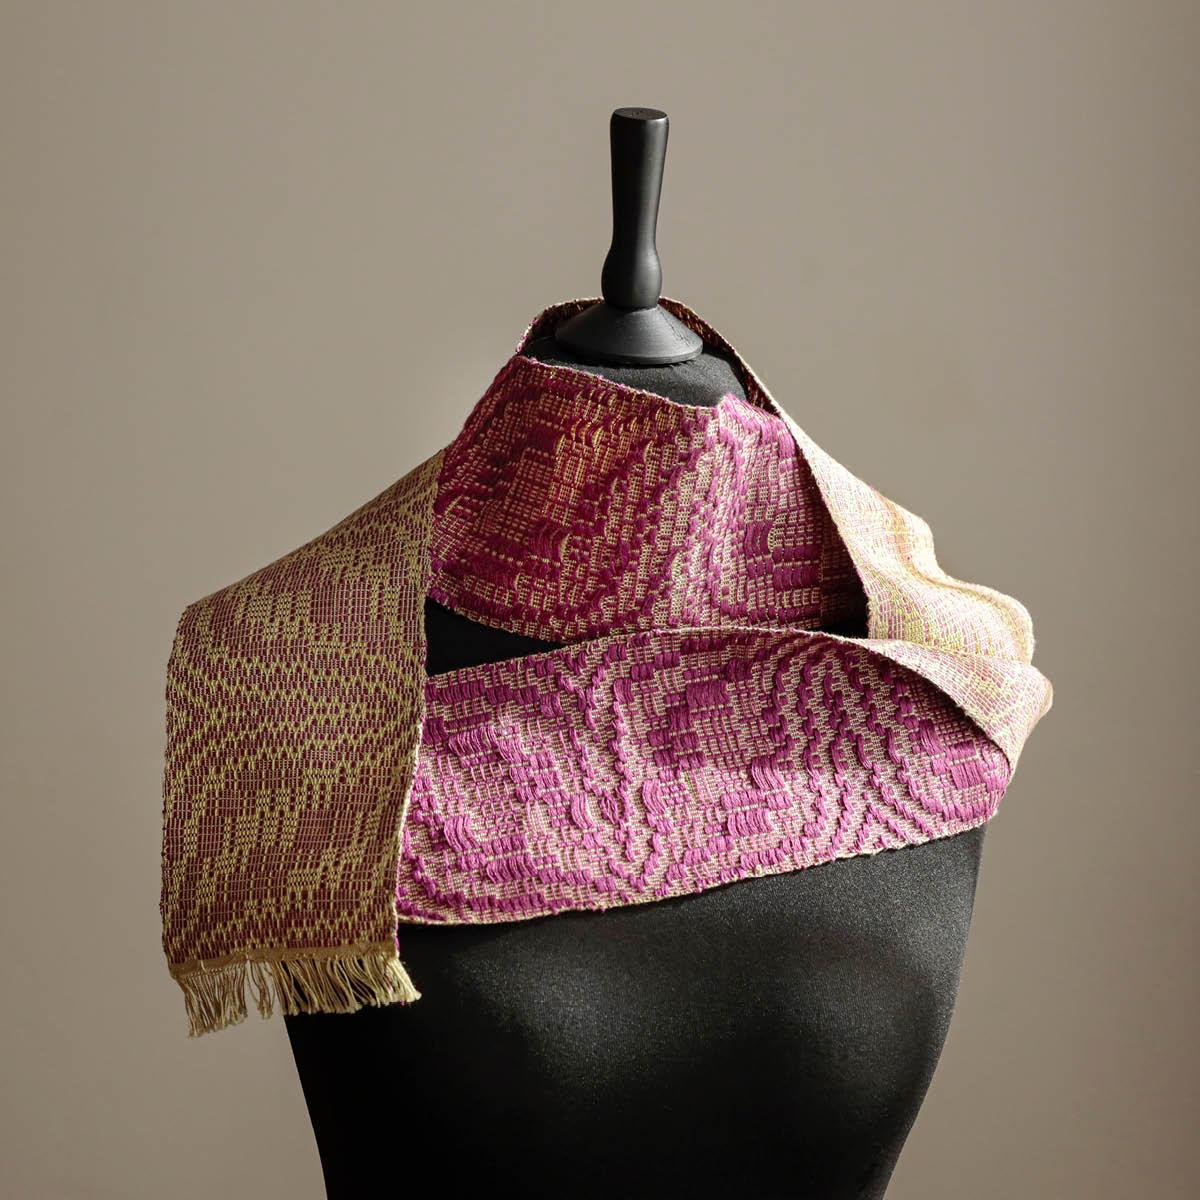 Small fabric pattern dalldraell cotton linen verena oppermann Italiano Plurale artist